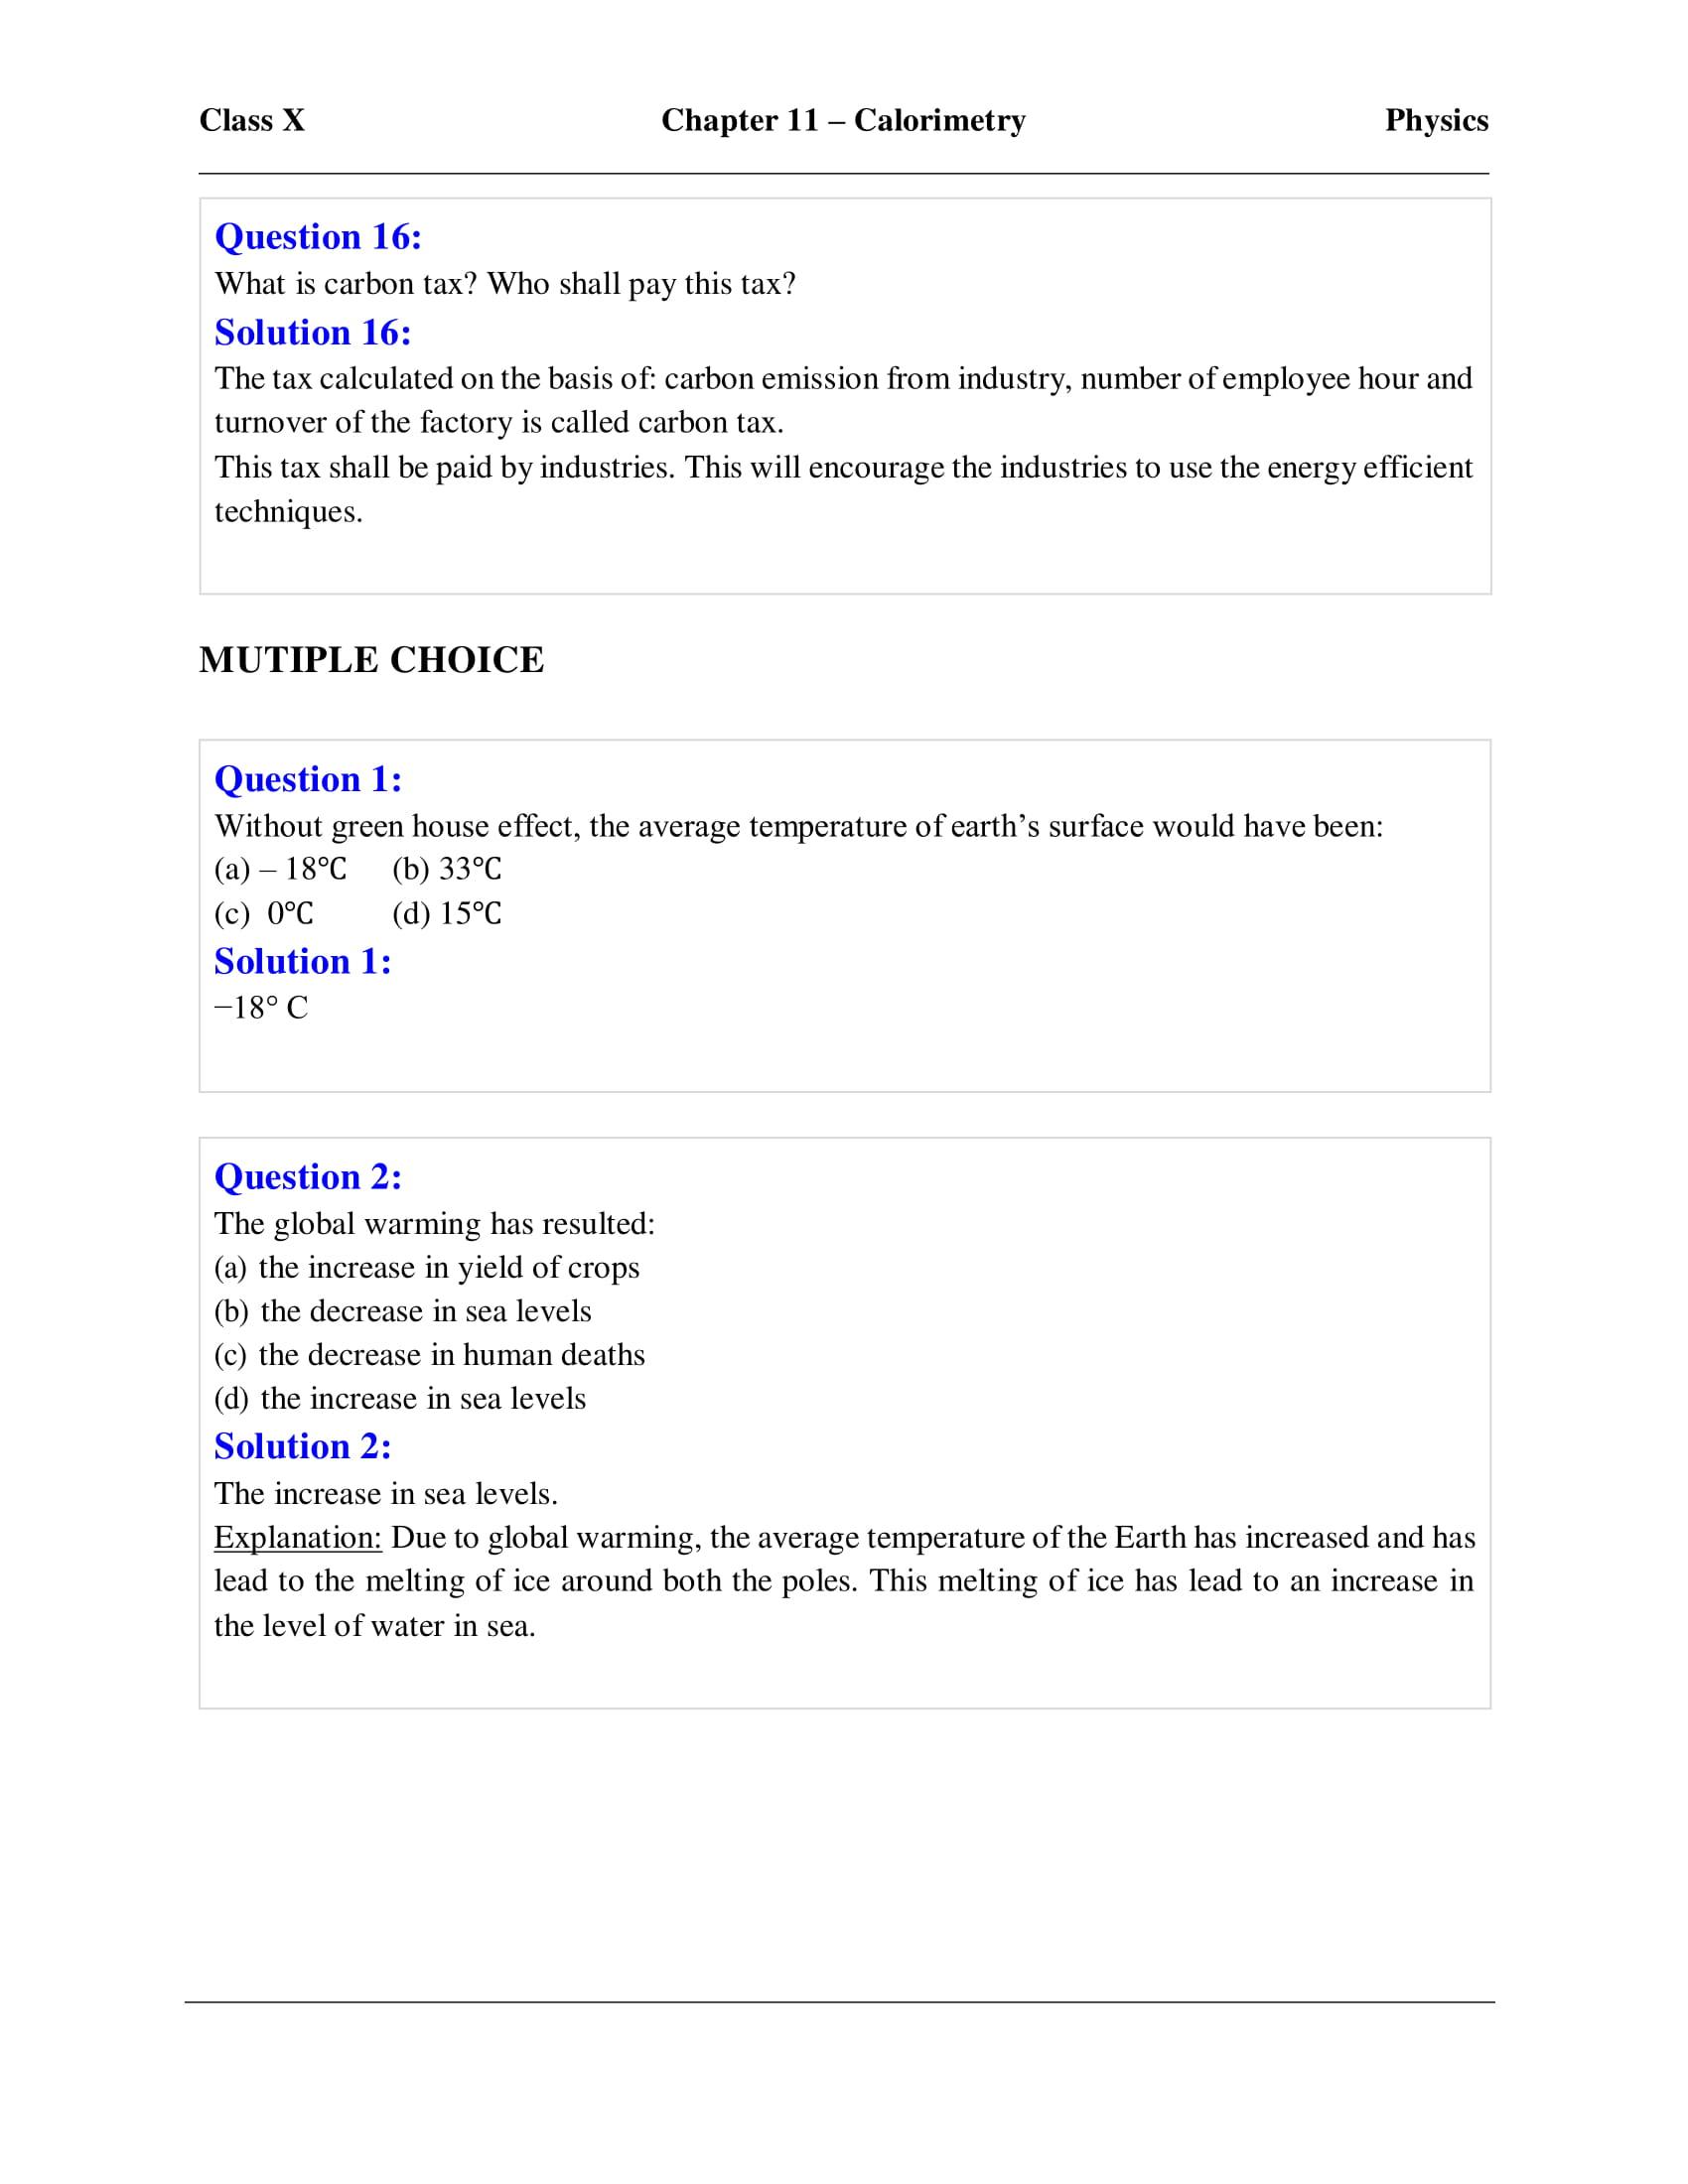 icse-selina-physics-solutions-class-10-chapter-11-calorimetry-35